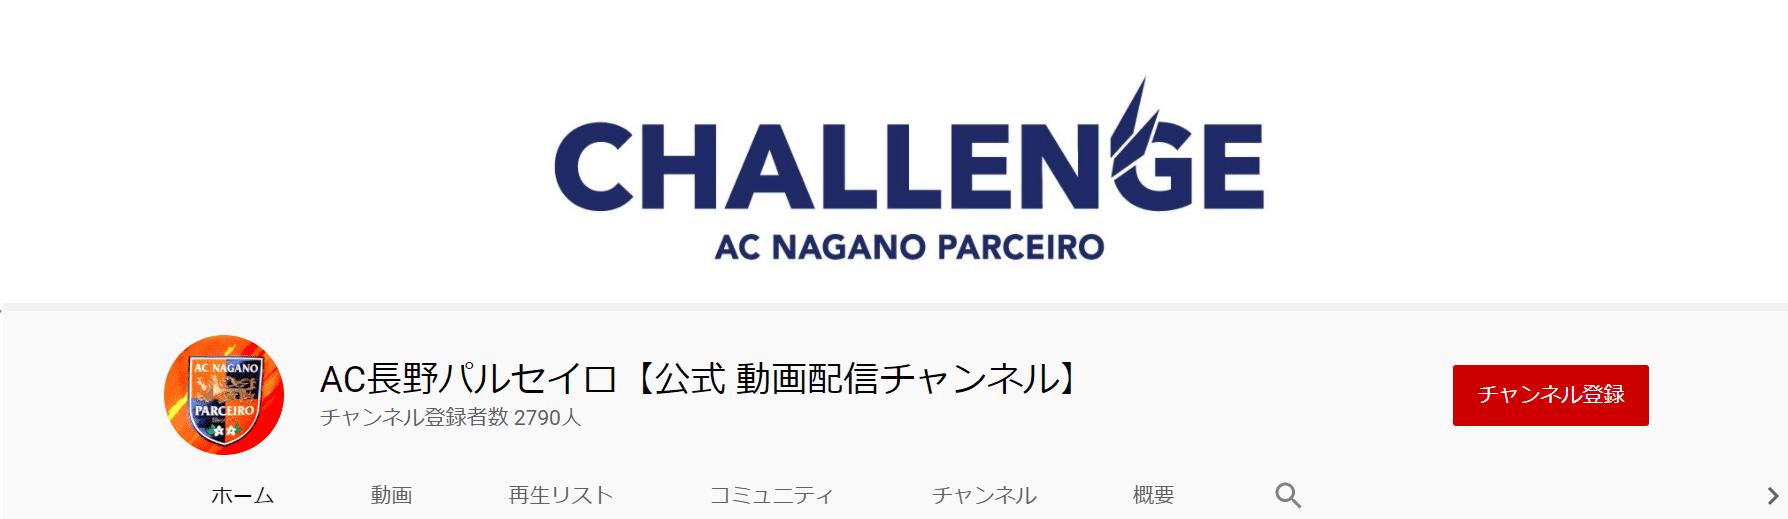 AC長野パルセイロ【公式-動画配信チャンネル】-YouTube (1)